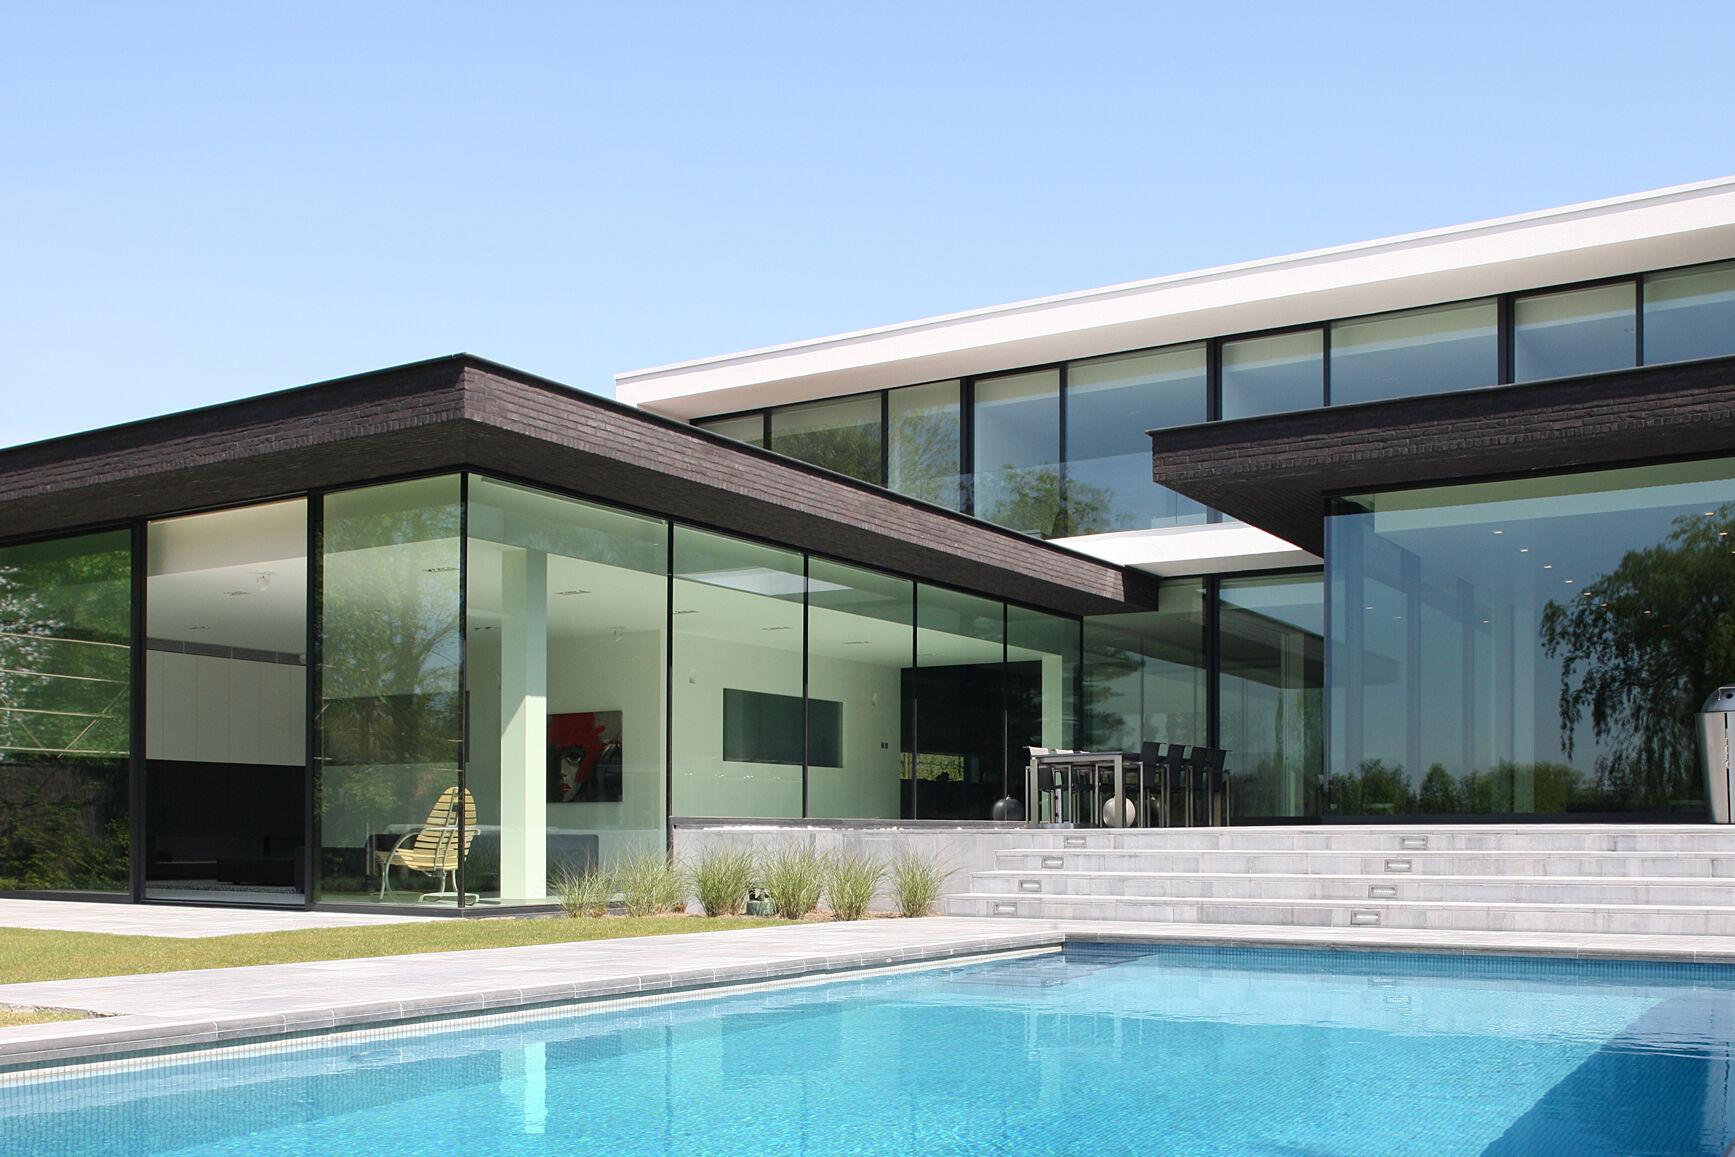 008 Lootens1 uai | Baeyens & Beck architecten Gent | architect nieuwbouw renovatie interieur | high end | architectenbureau